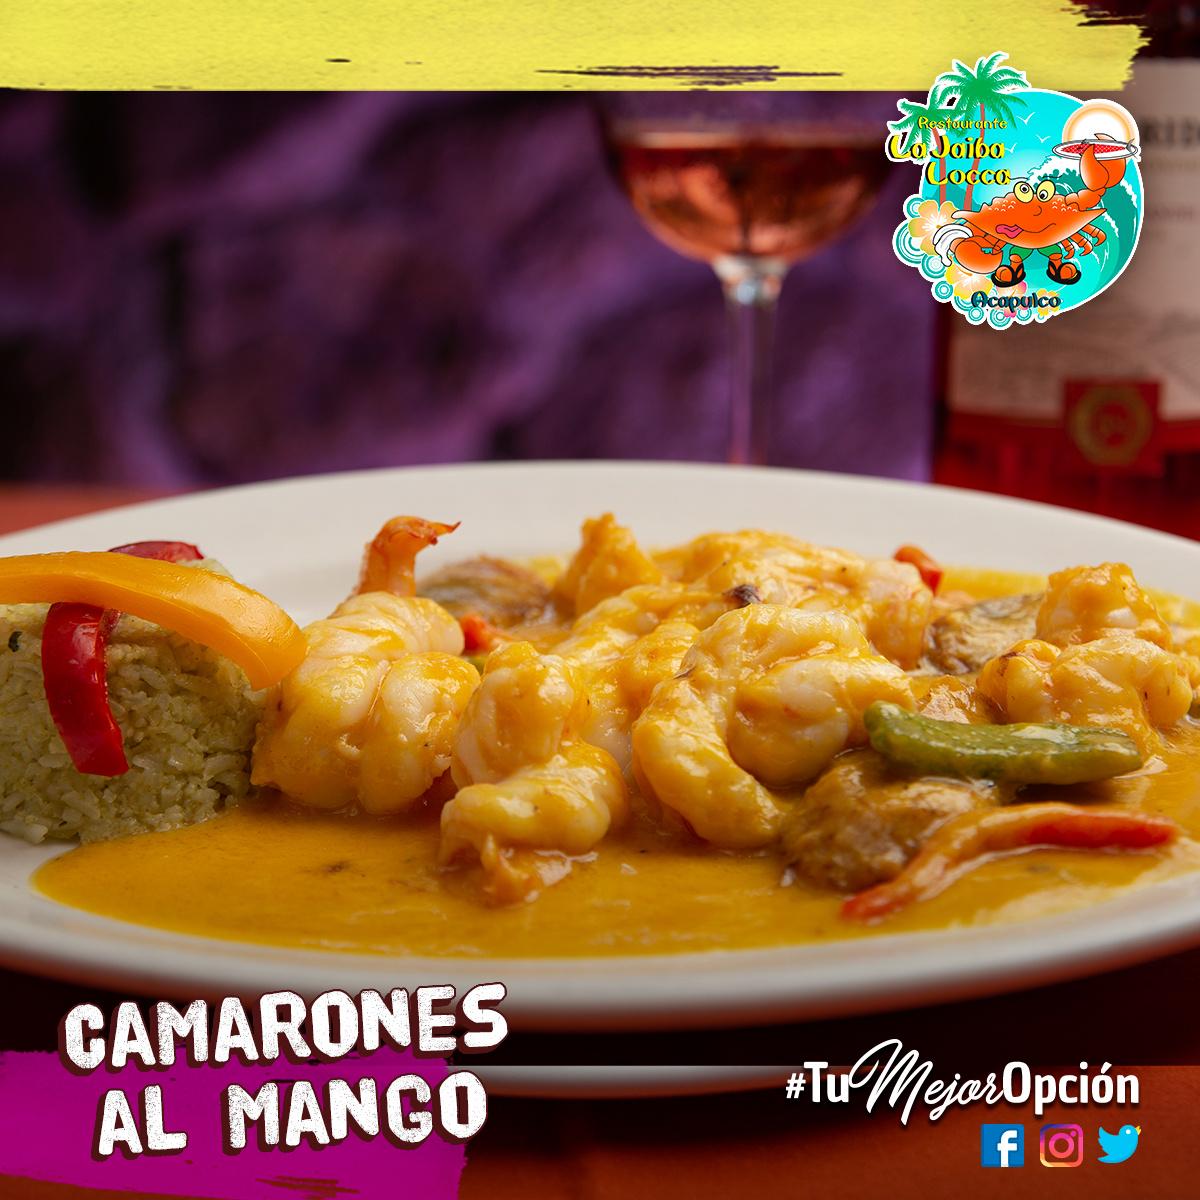 https://0201.nccdn.net/1_2/000/000/089/2c1/Camarones-al-mango-1200x1200.jpg